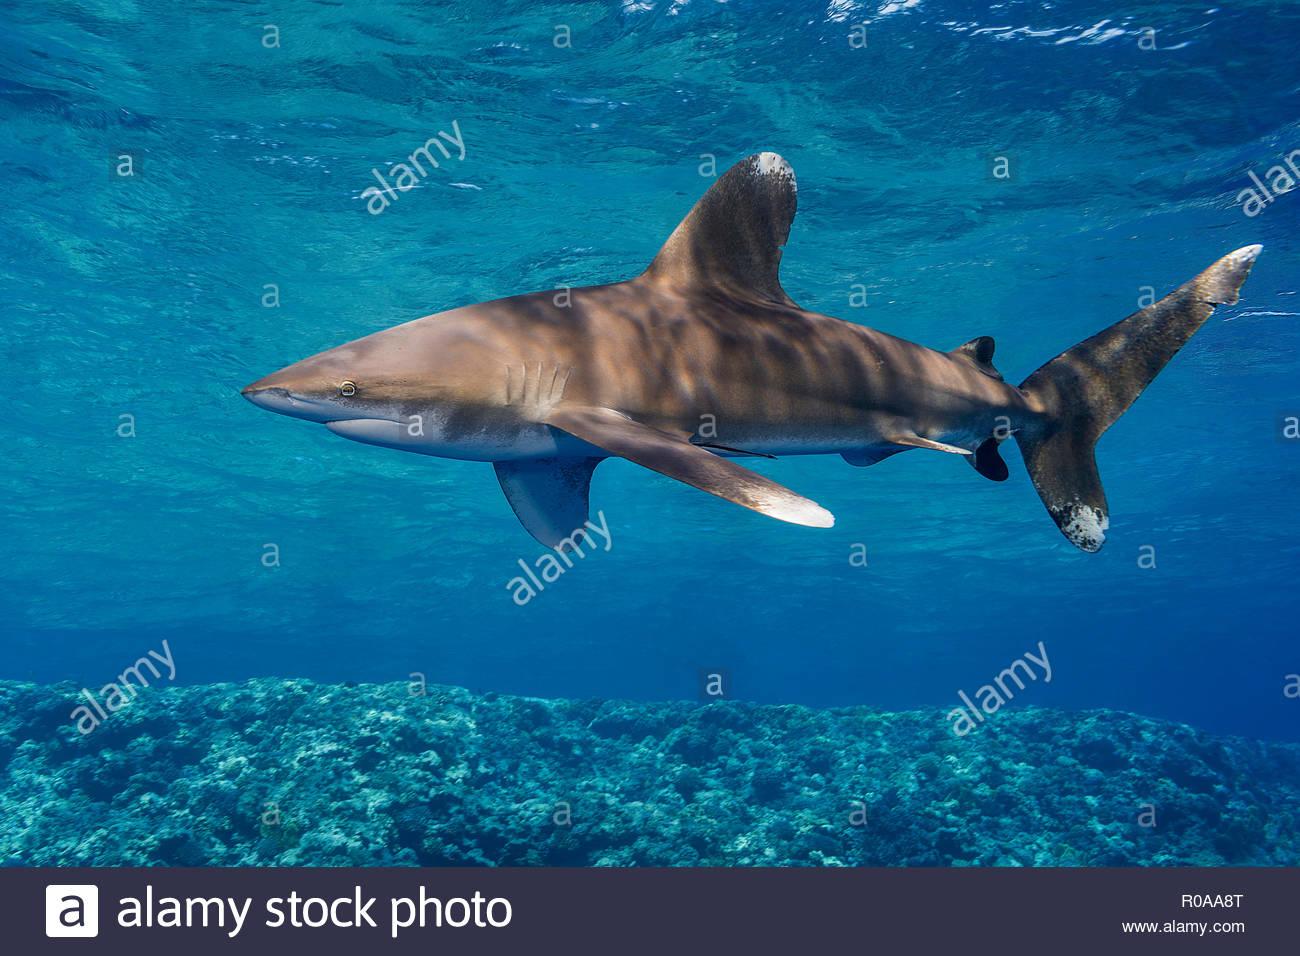 Weißspitzen-Hochseehai (Carcharhinus Longimanus), Brother Islands, Ägypten | Oceanic whitetip shark (Carcharhinus longimanus), Brother Islands, Egypt - Stock Image